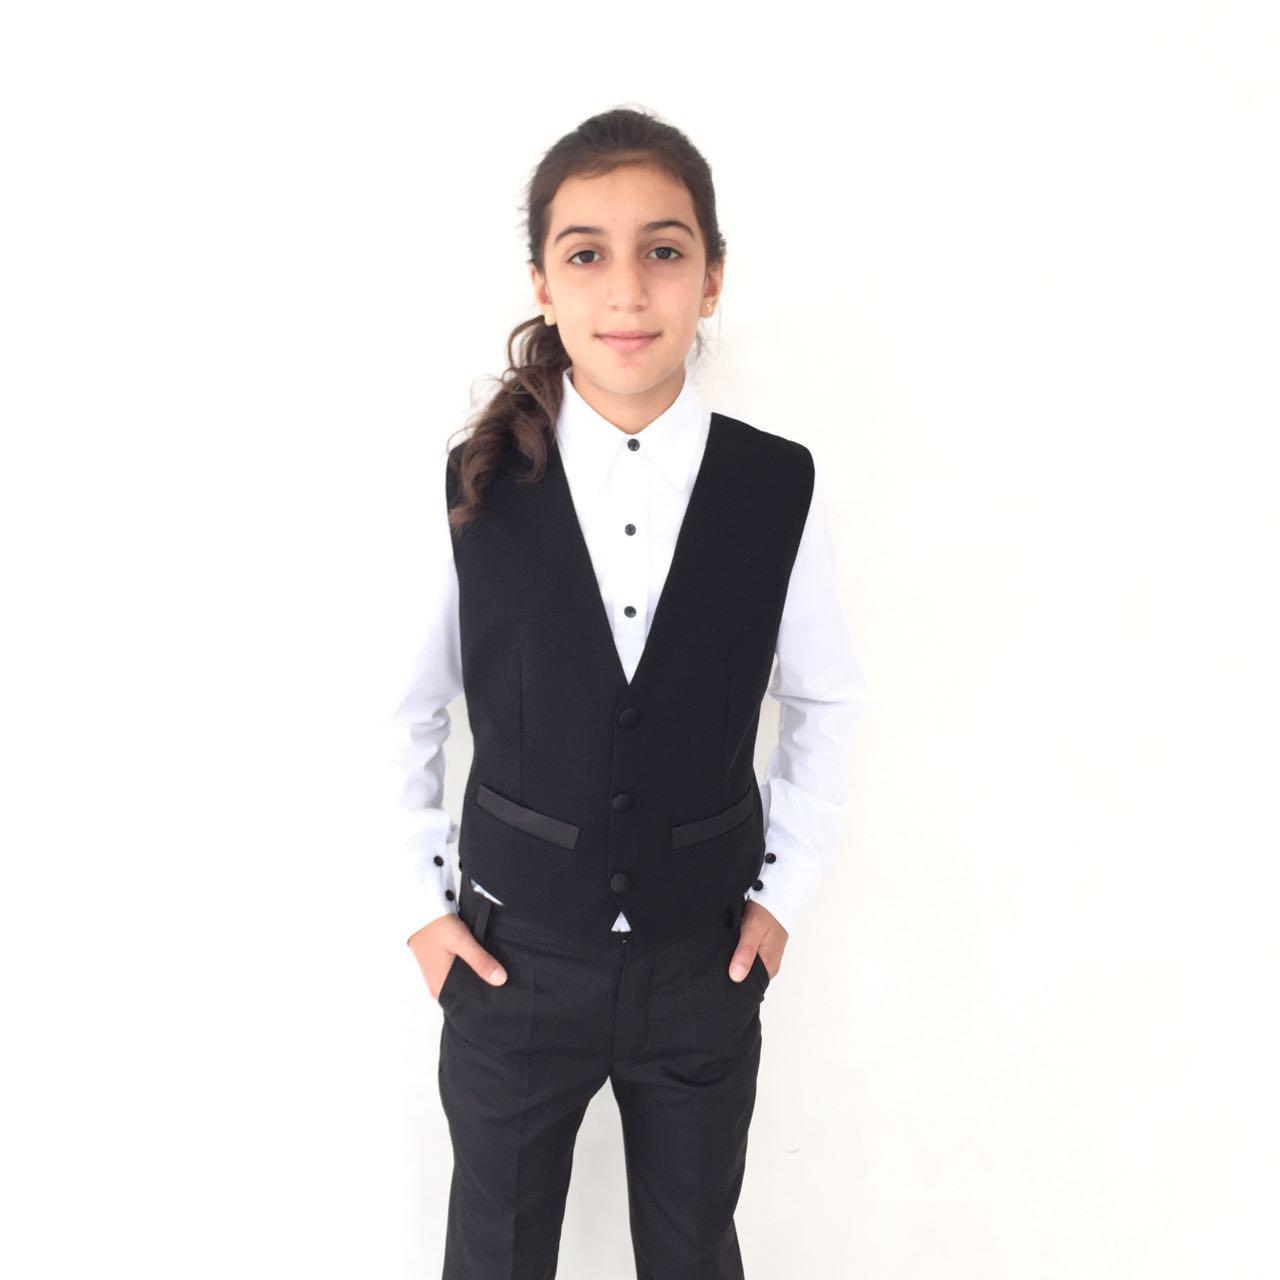 54378 Брюки для девочки (костюмная) ТЕМНО-СИНИЙ